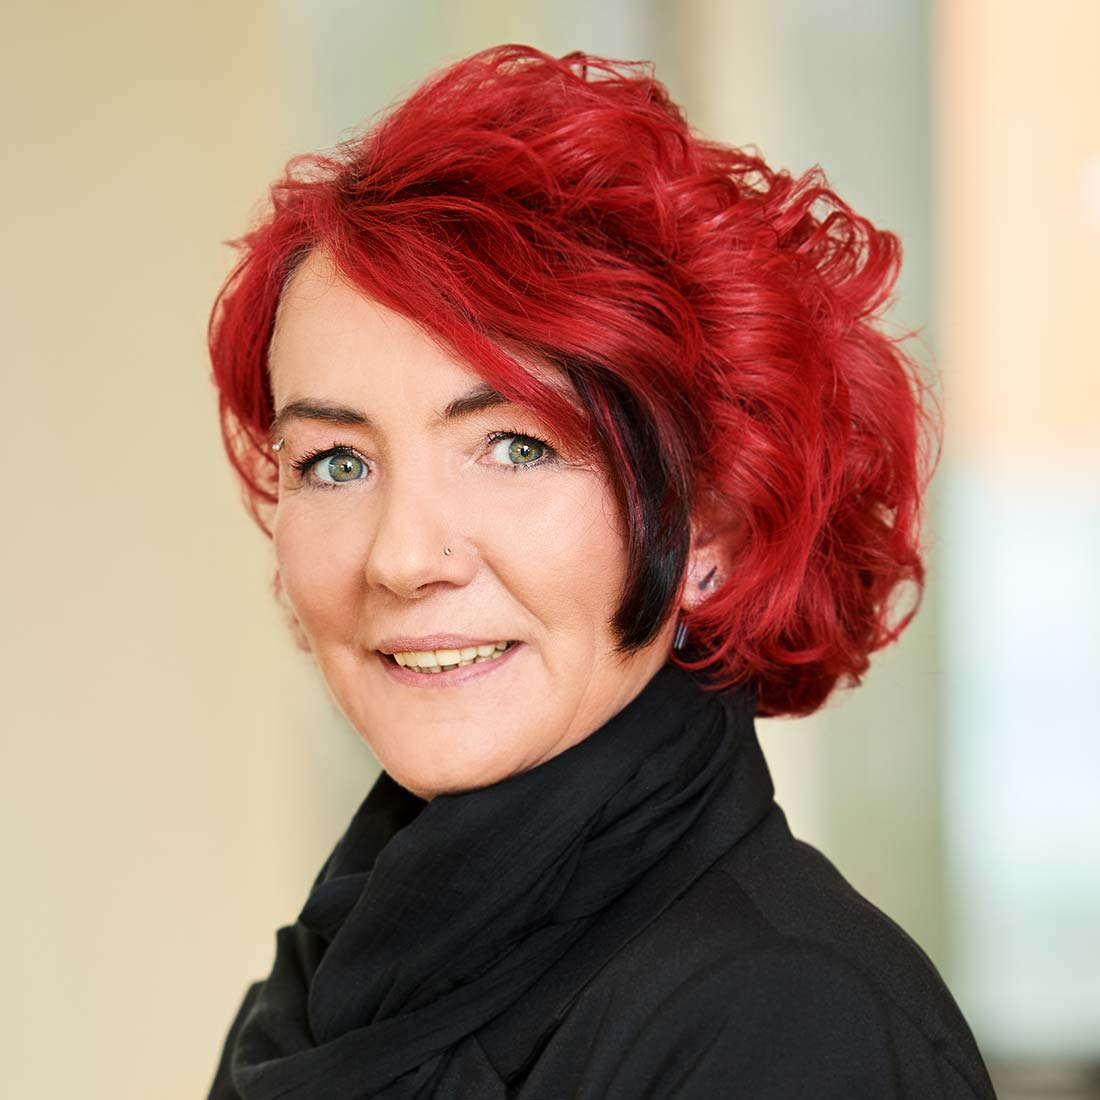 Corporate Portraitfoto für Friseur Klees in Meudt